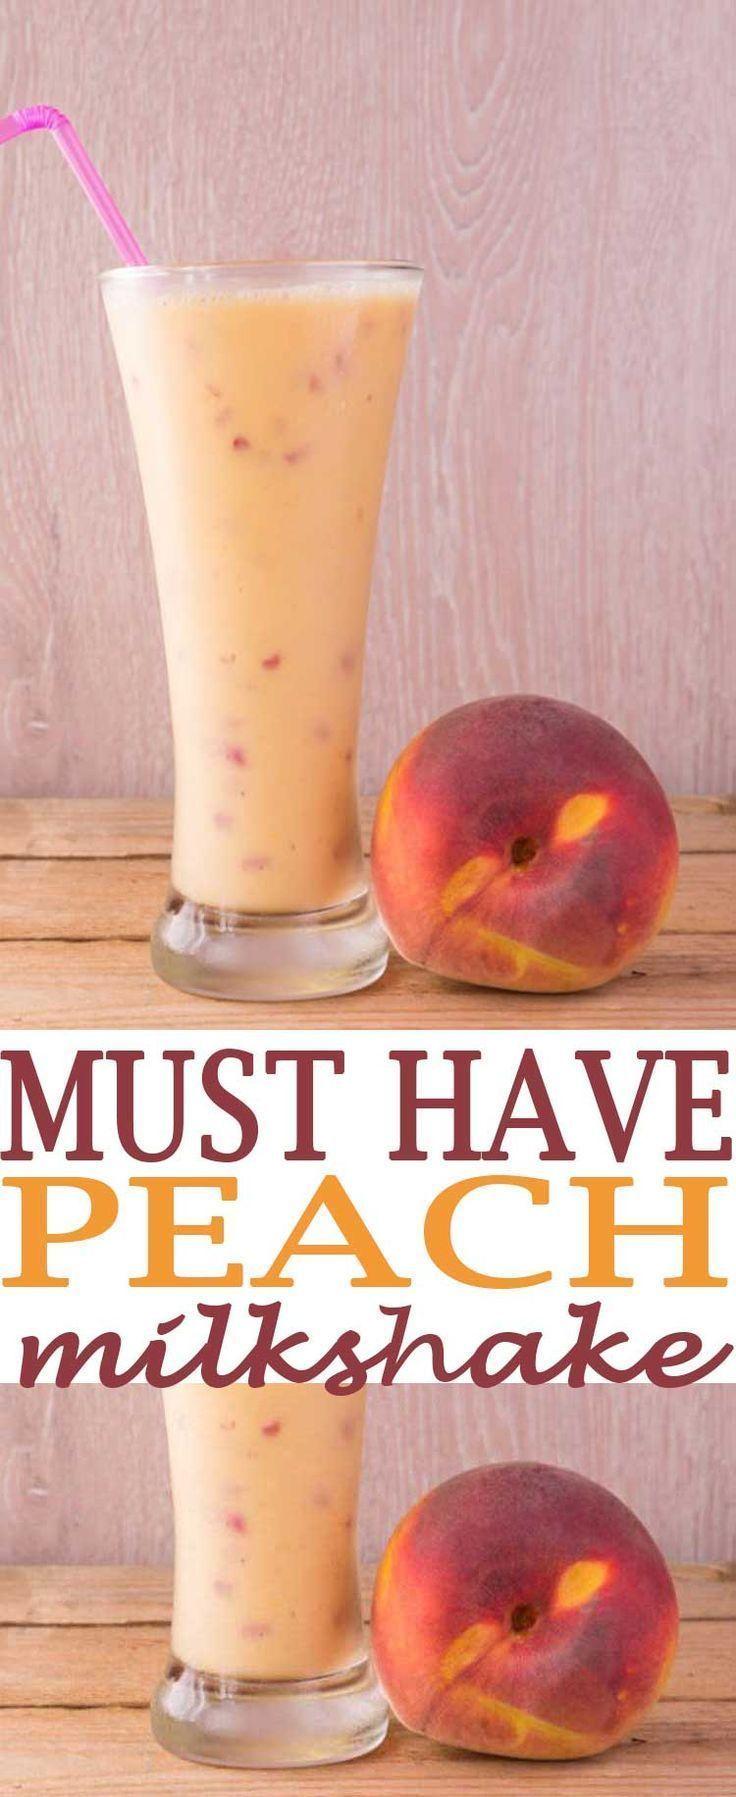 Peach Soy Milkshake Peach Milkshake With Soy Milk Our Peach Milk Shake With Soy Milk Is So Delicious Soy Soy Milk Recipes Peach Milkshake Milkshake Recipes